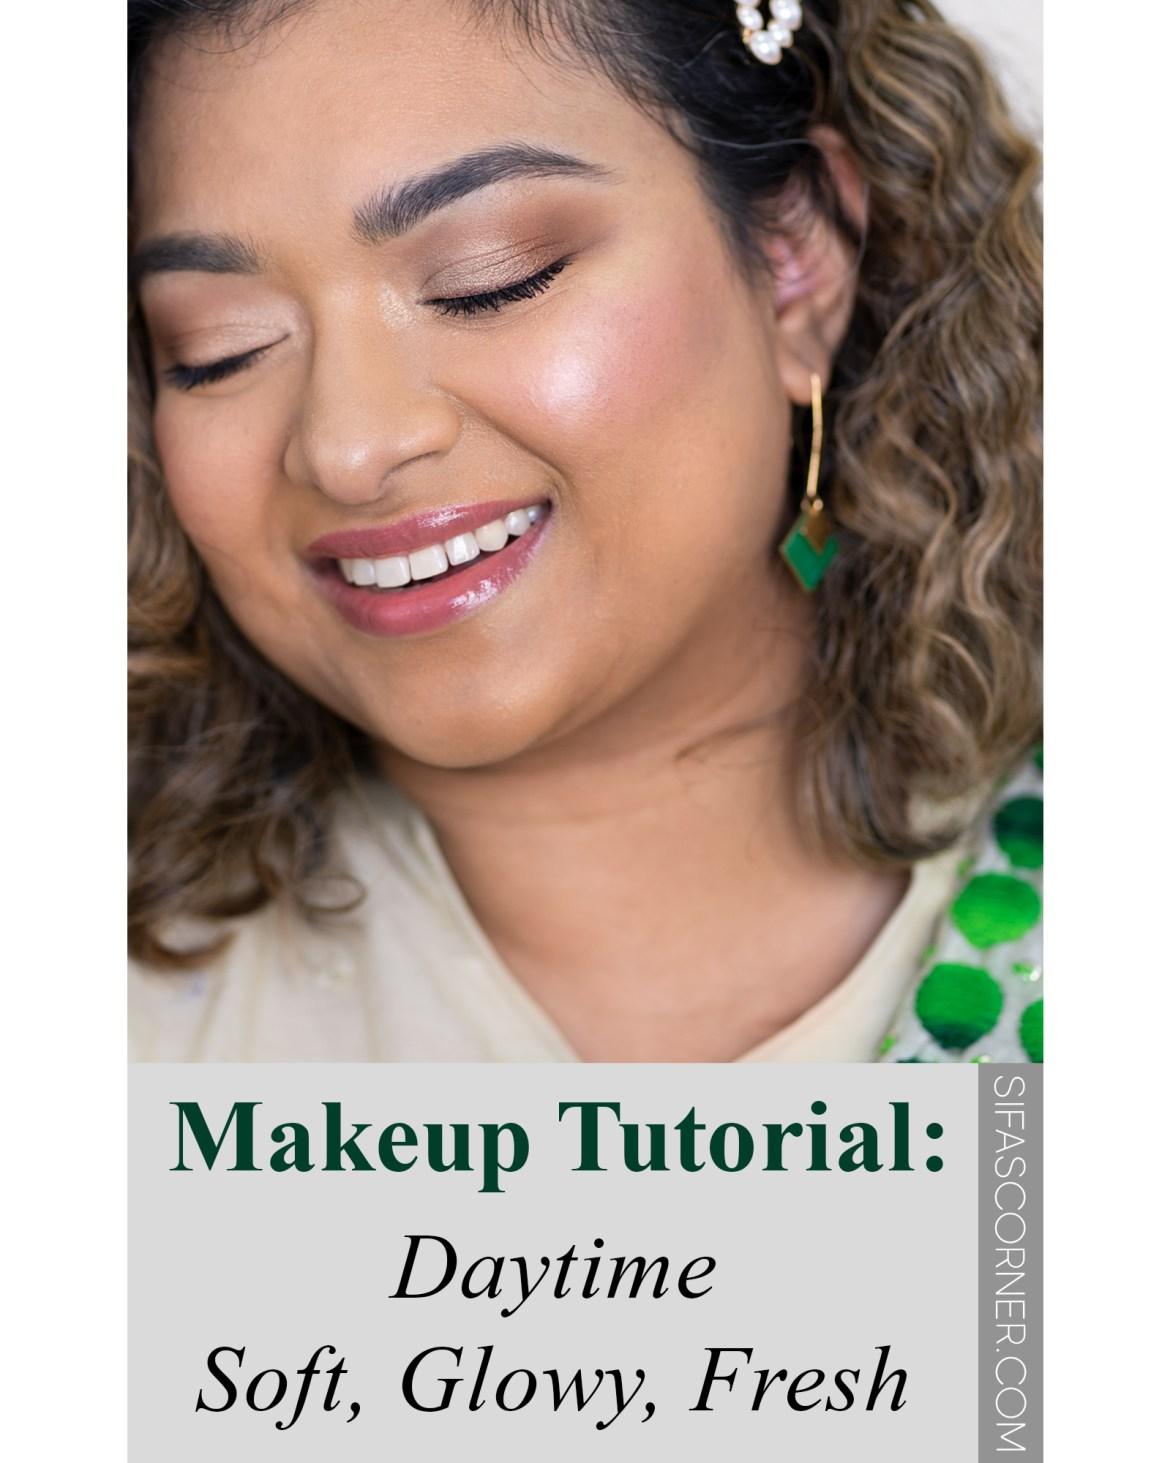 Daytime Soft Glowy Fresh Makeup Tutorial